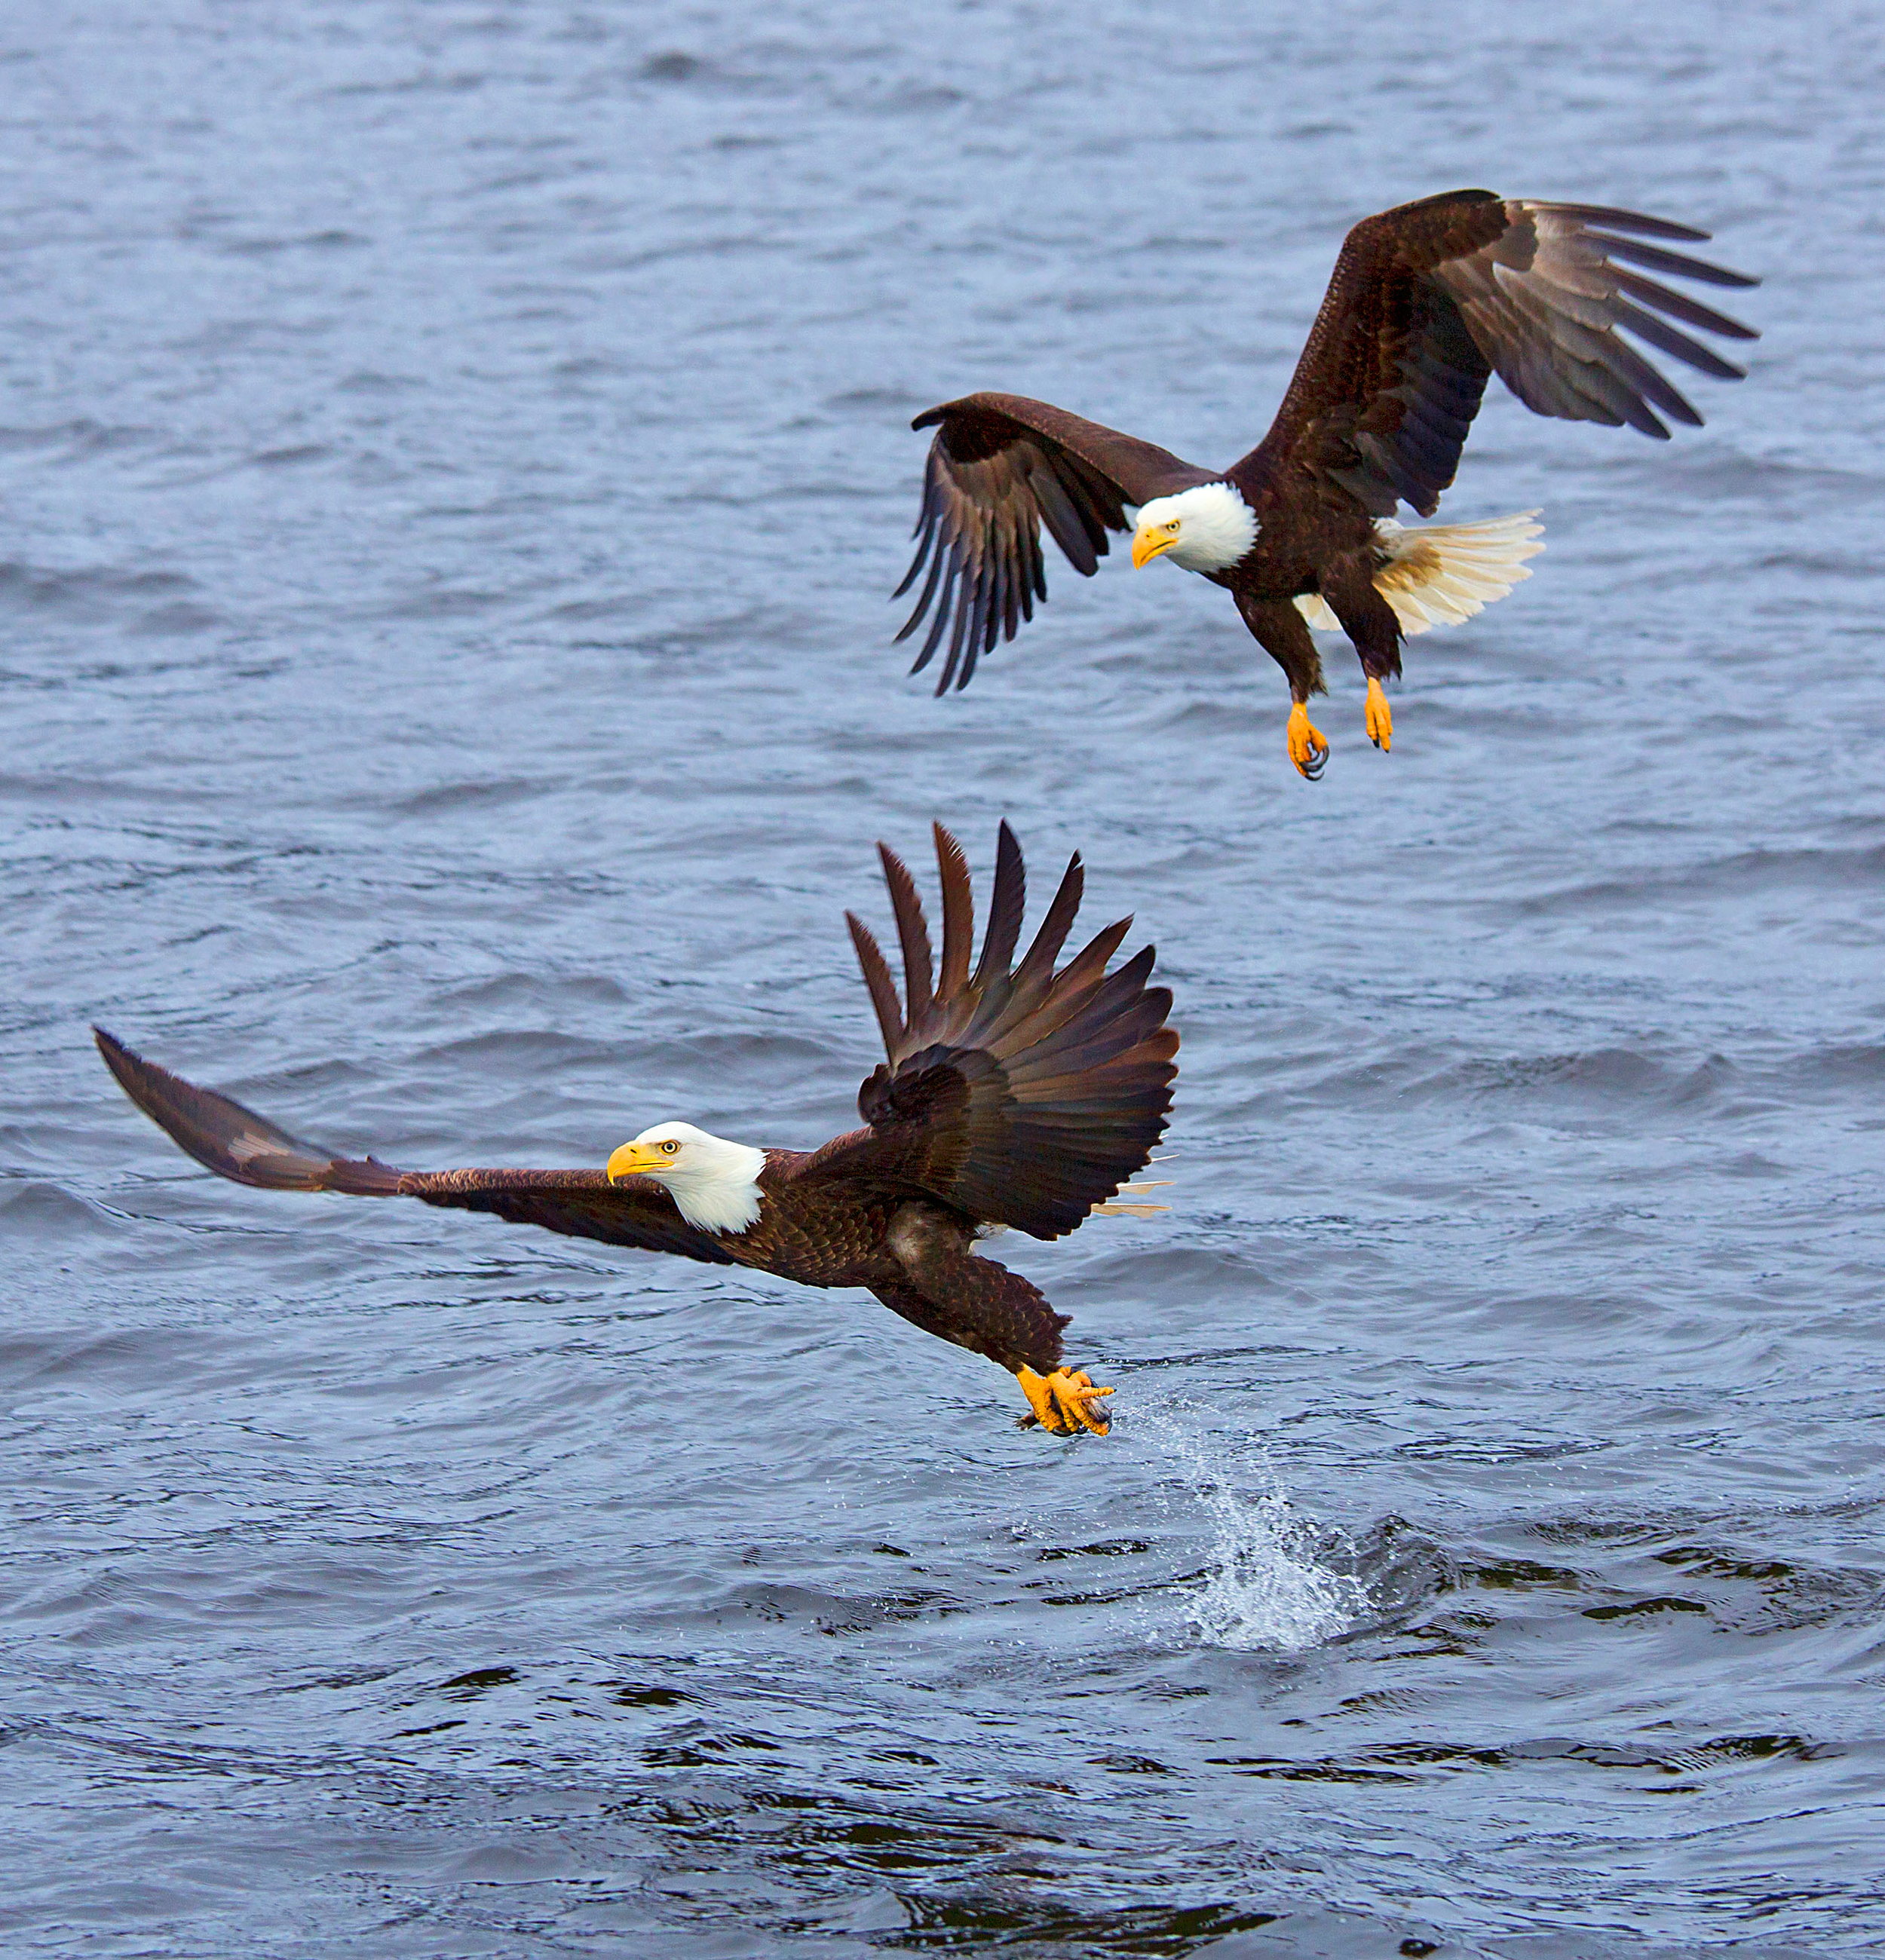 Rick Sammon's Birds035.jpg